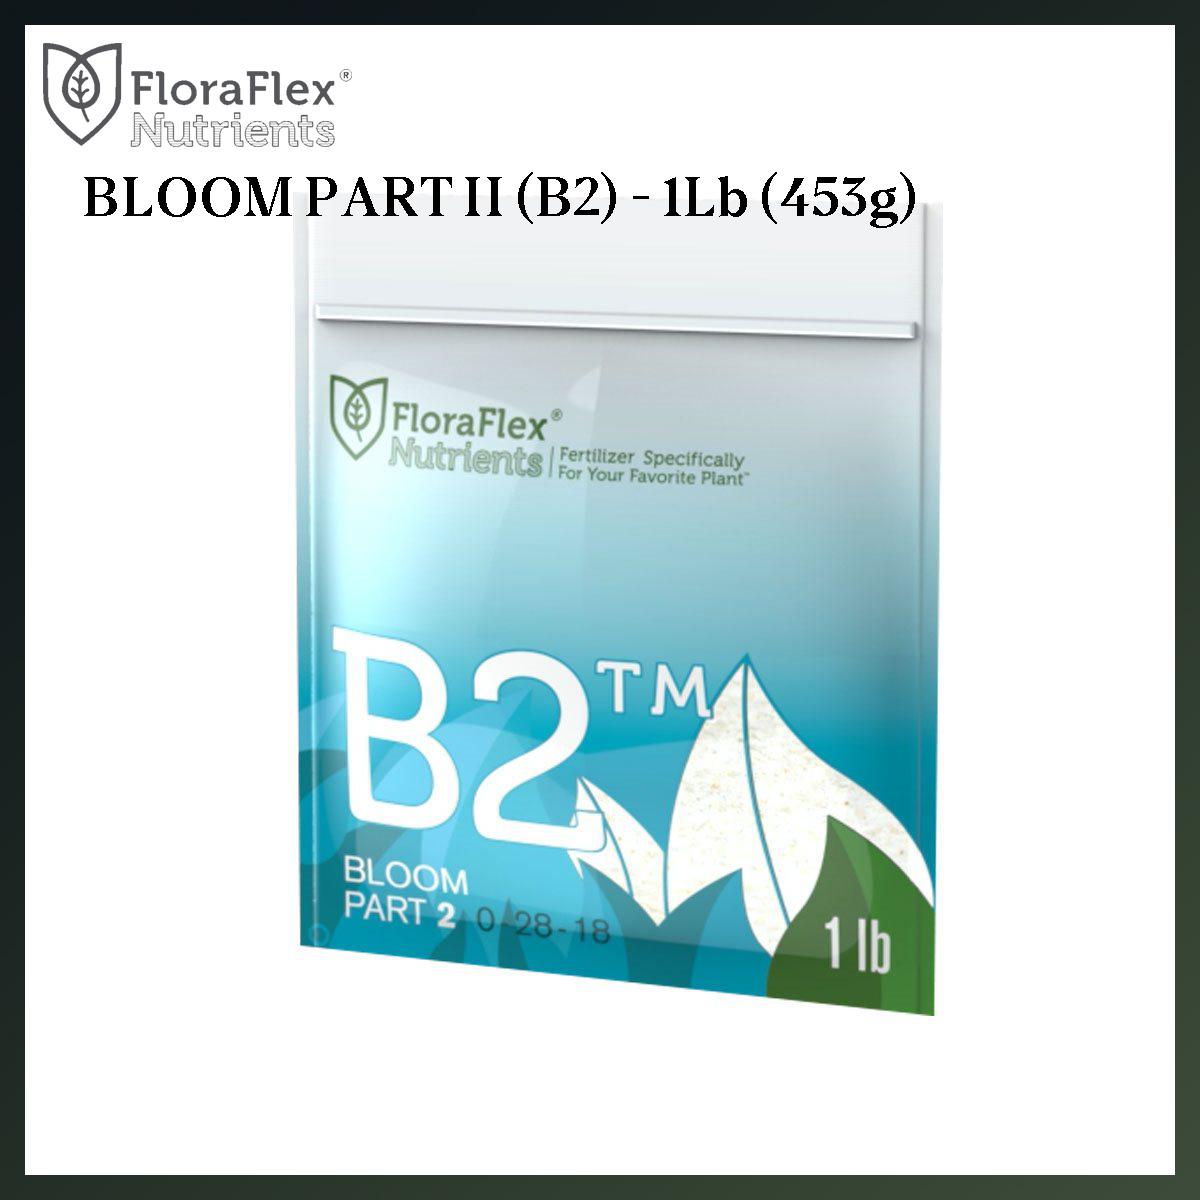 FLORA FLEX 1Lb NUTRIENT (453g) B2